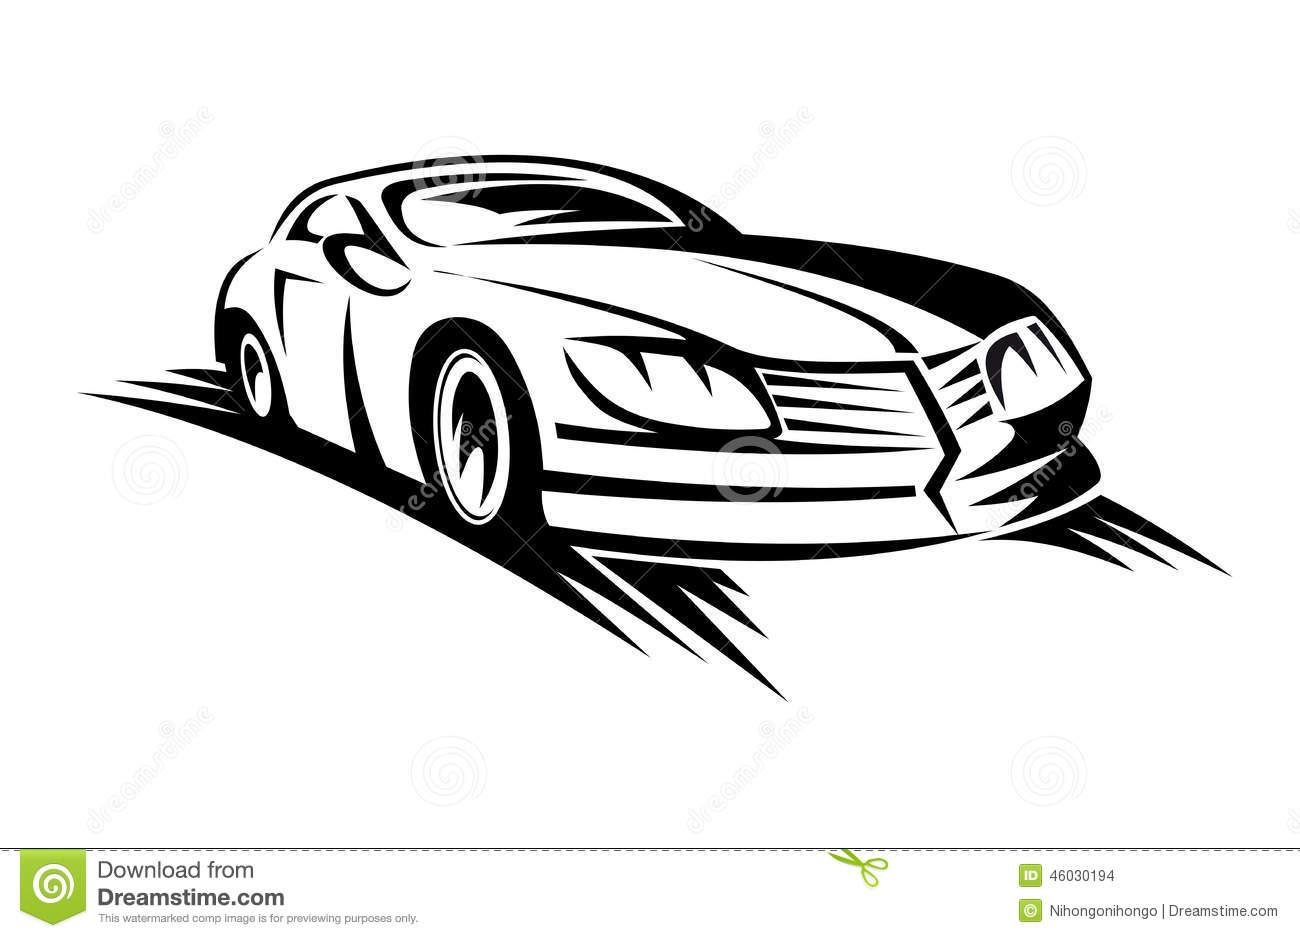 Vehicle clipart fast car Fast car Clipart  fast